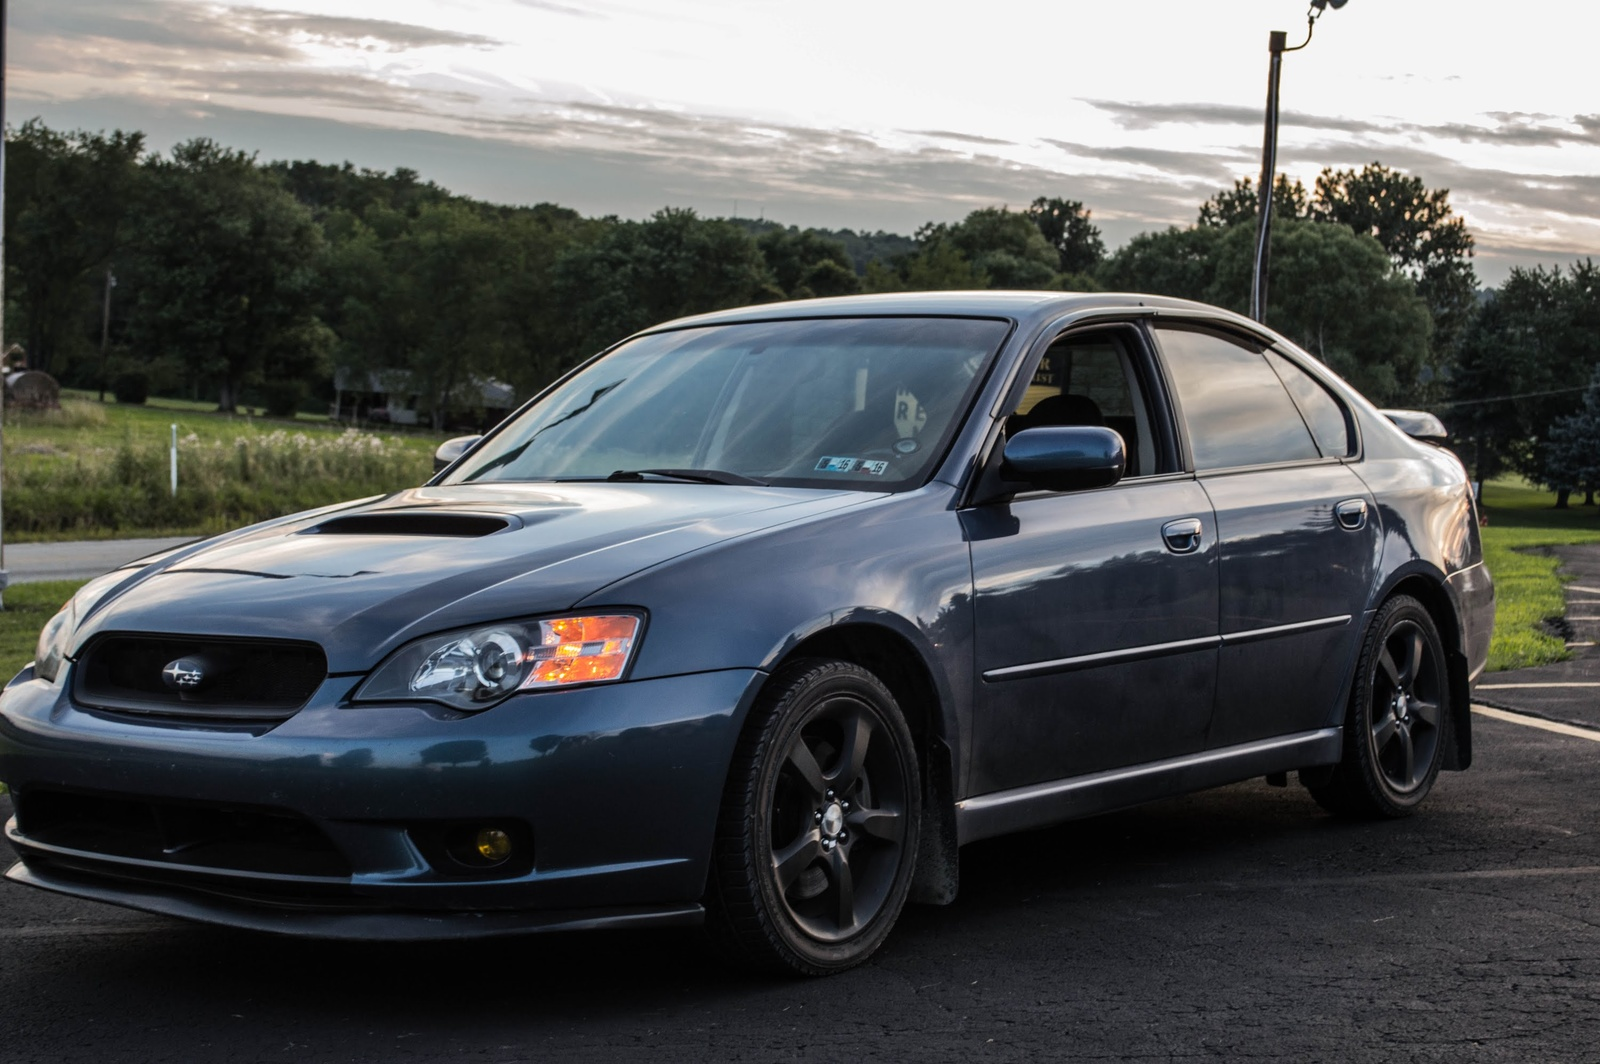 Subaru Legacy Questions - Piston rings keep getting blown  Any